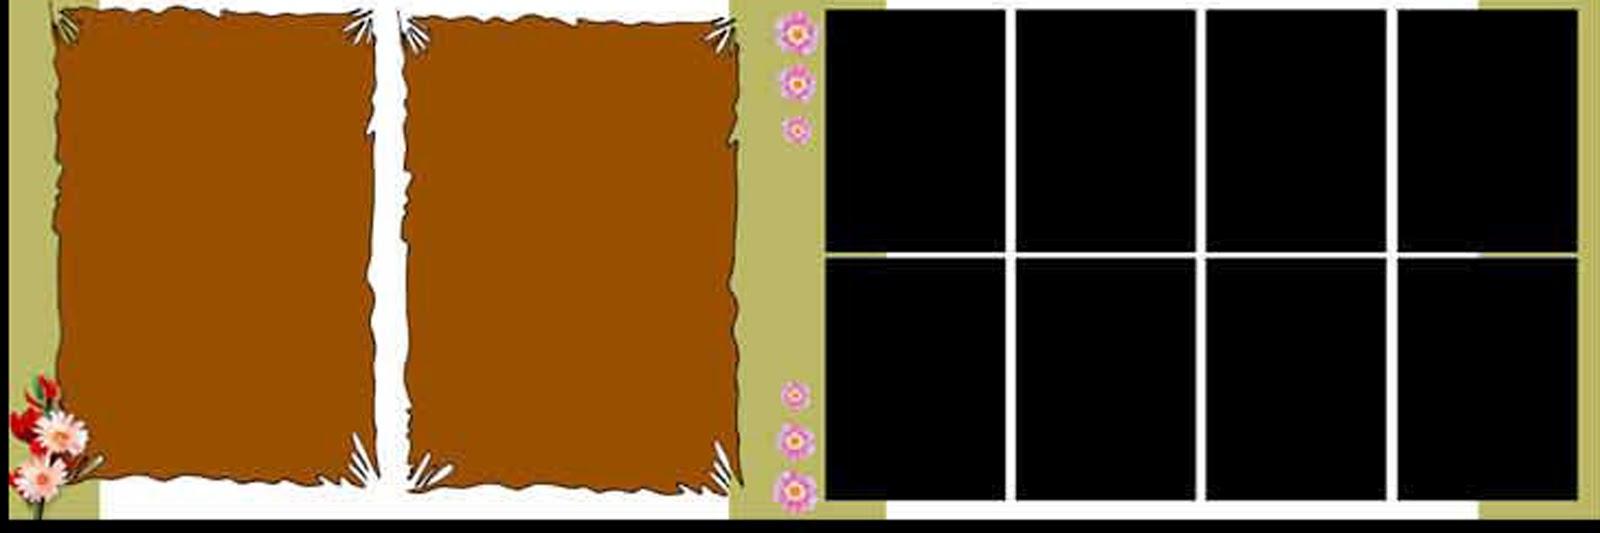 12x36 Karizma Backgrounds 12x36 Karizma Album Frames